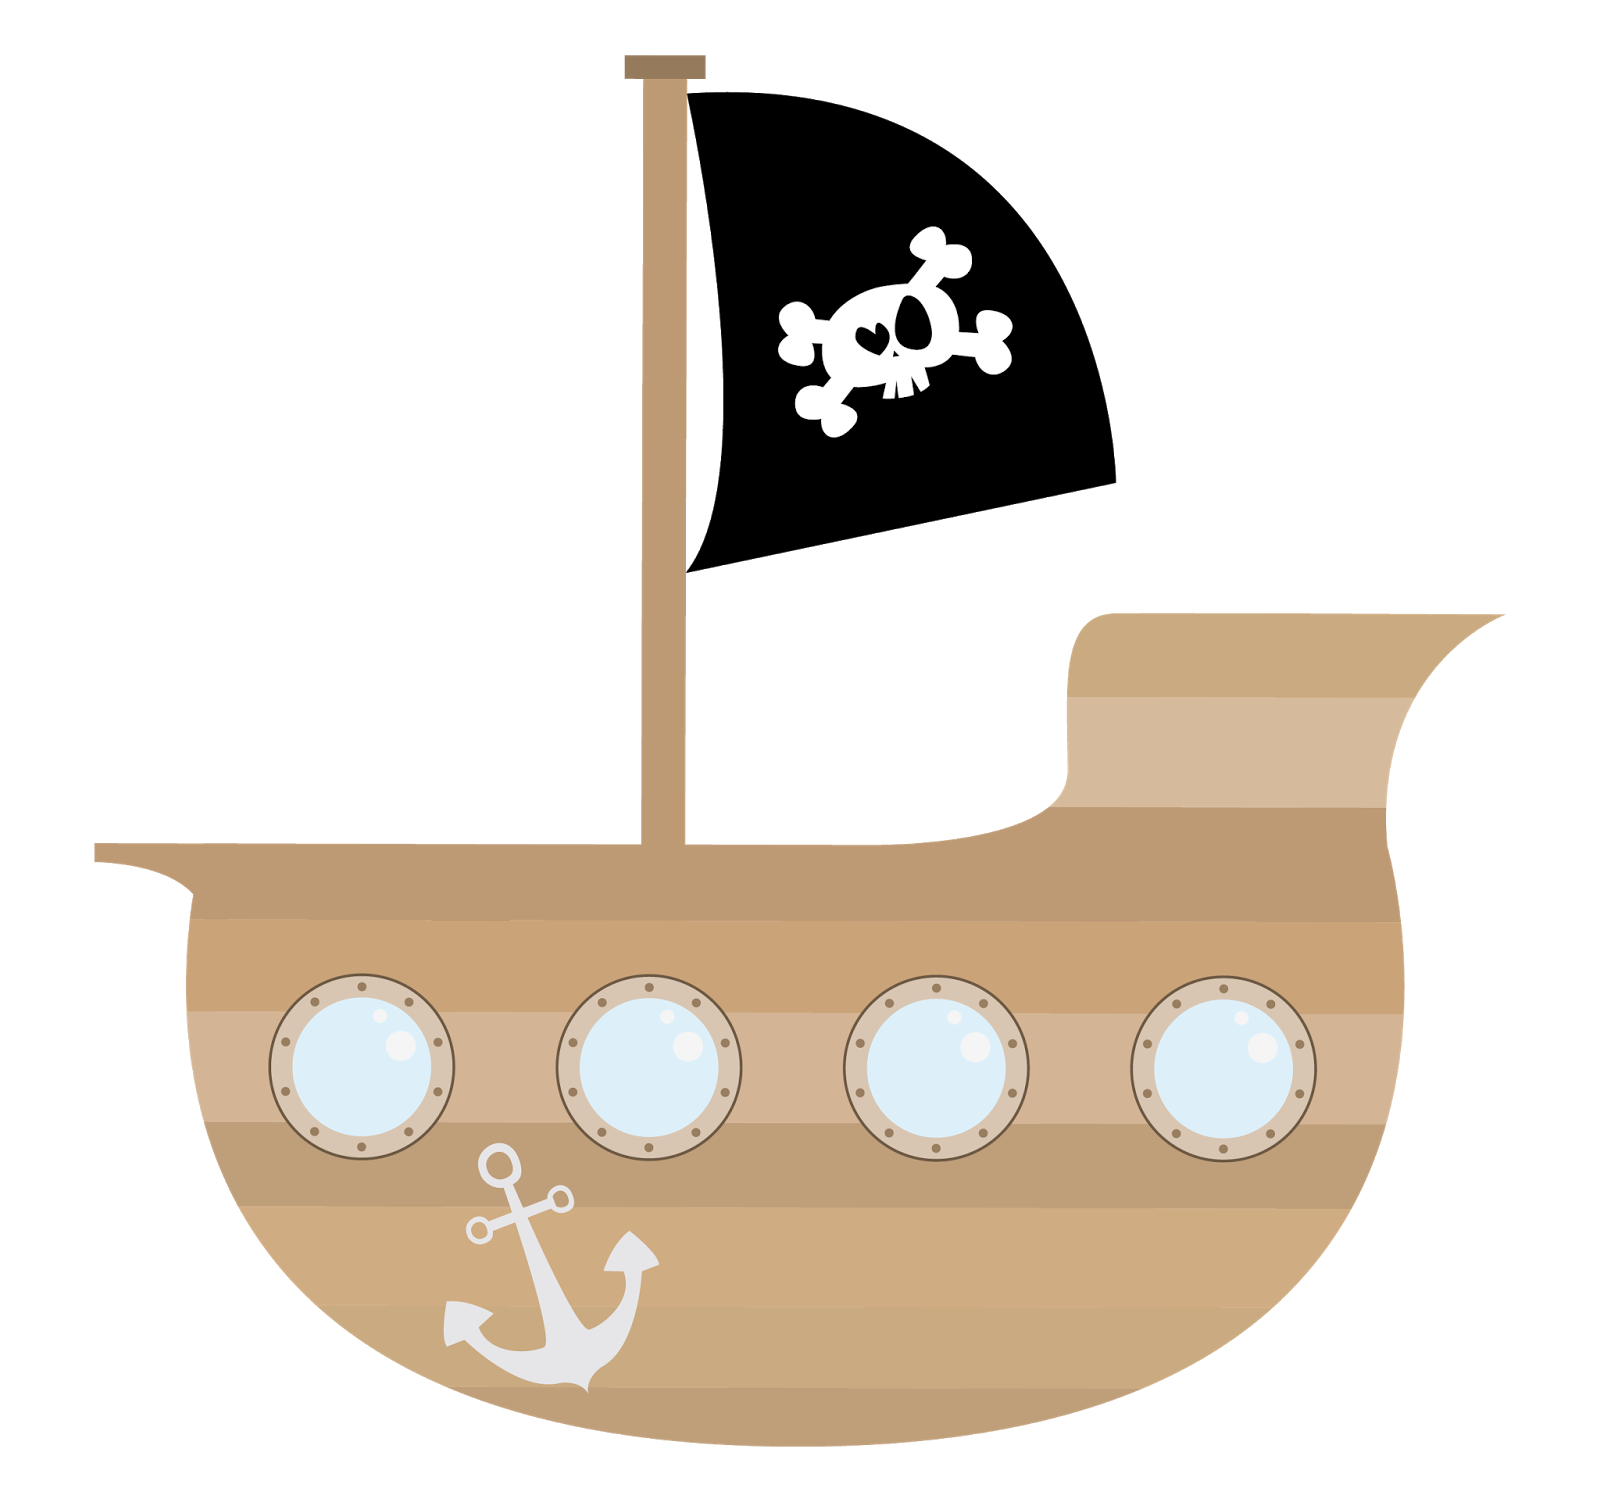 Pirate Ship Clipart Clipart Kid Cartoon Pirate Ship Pirate Ship Pirate Theme